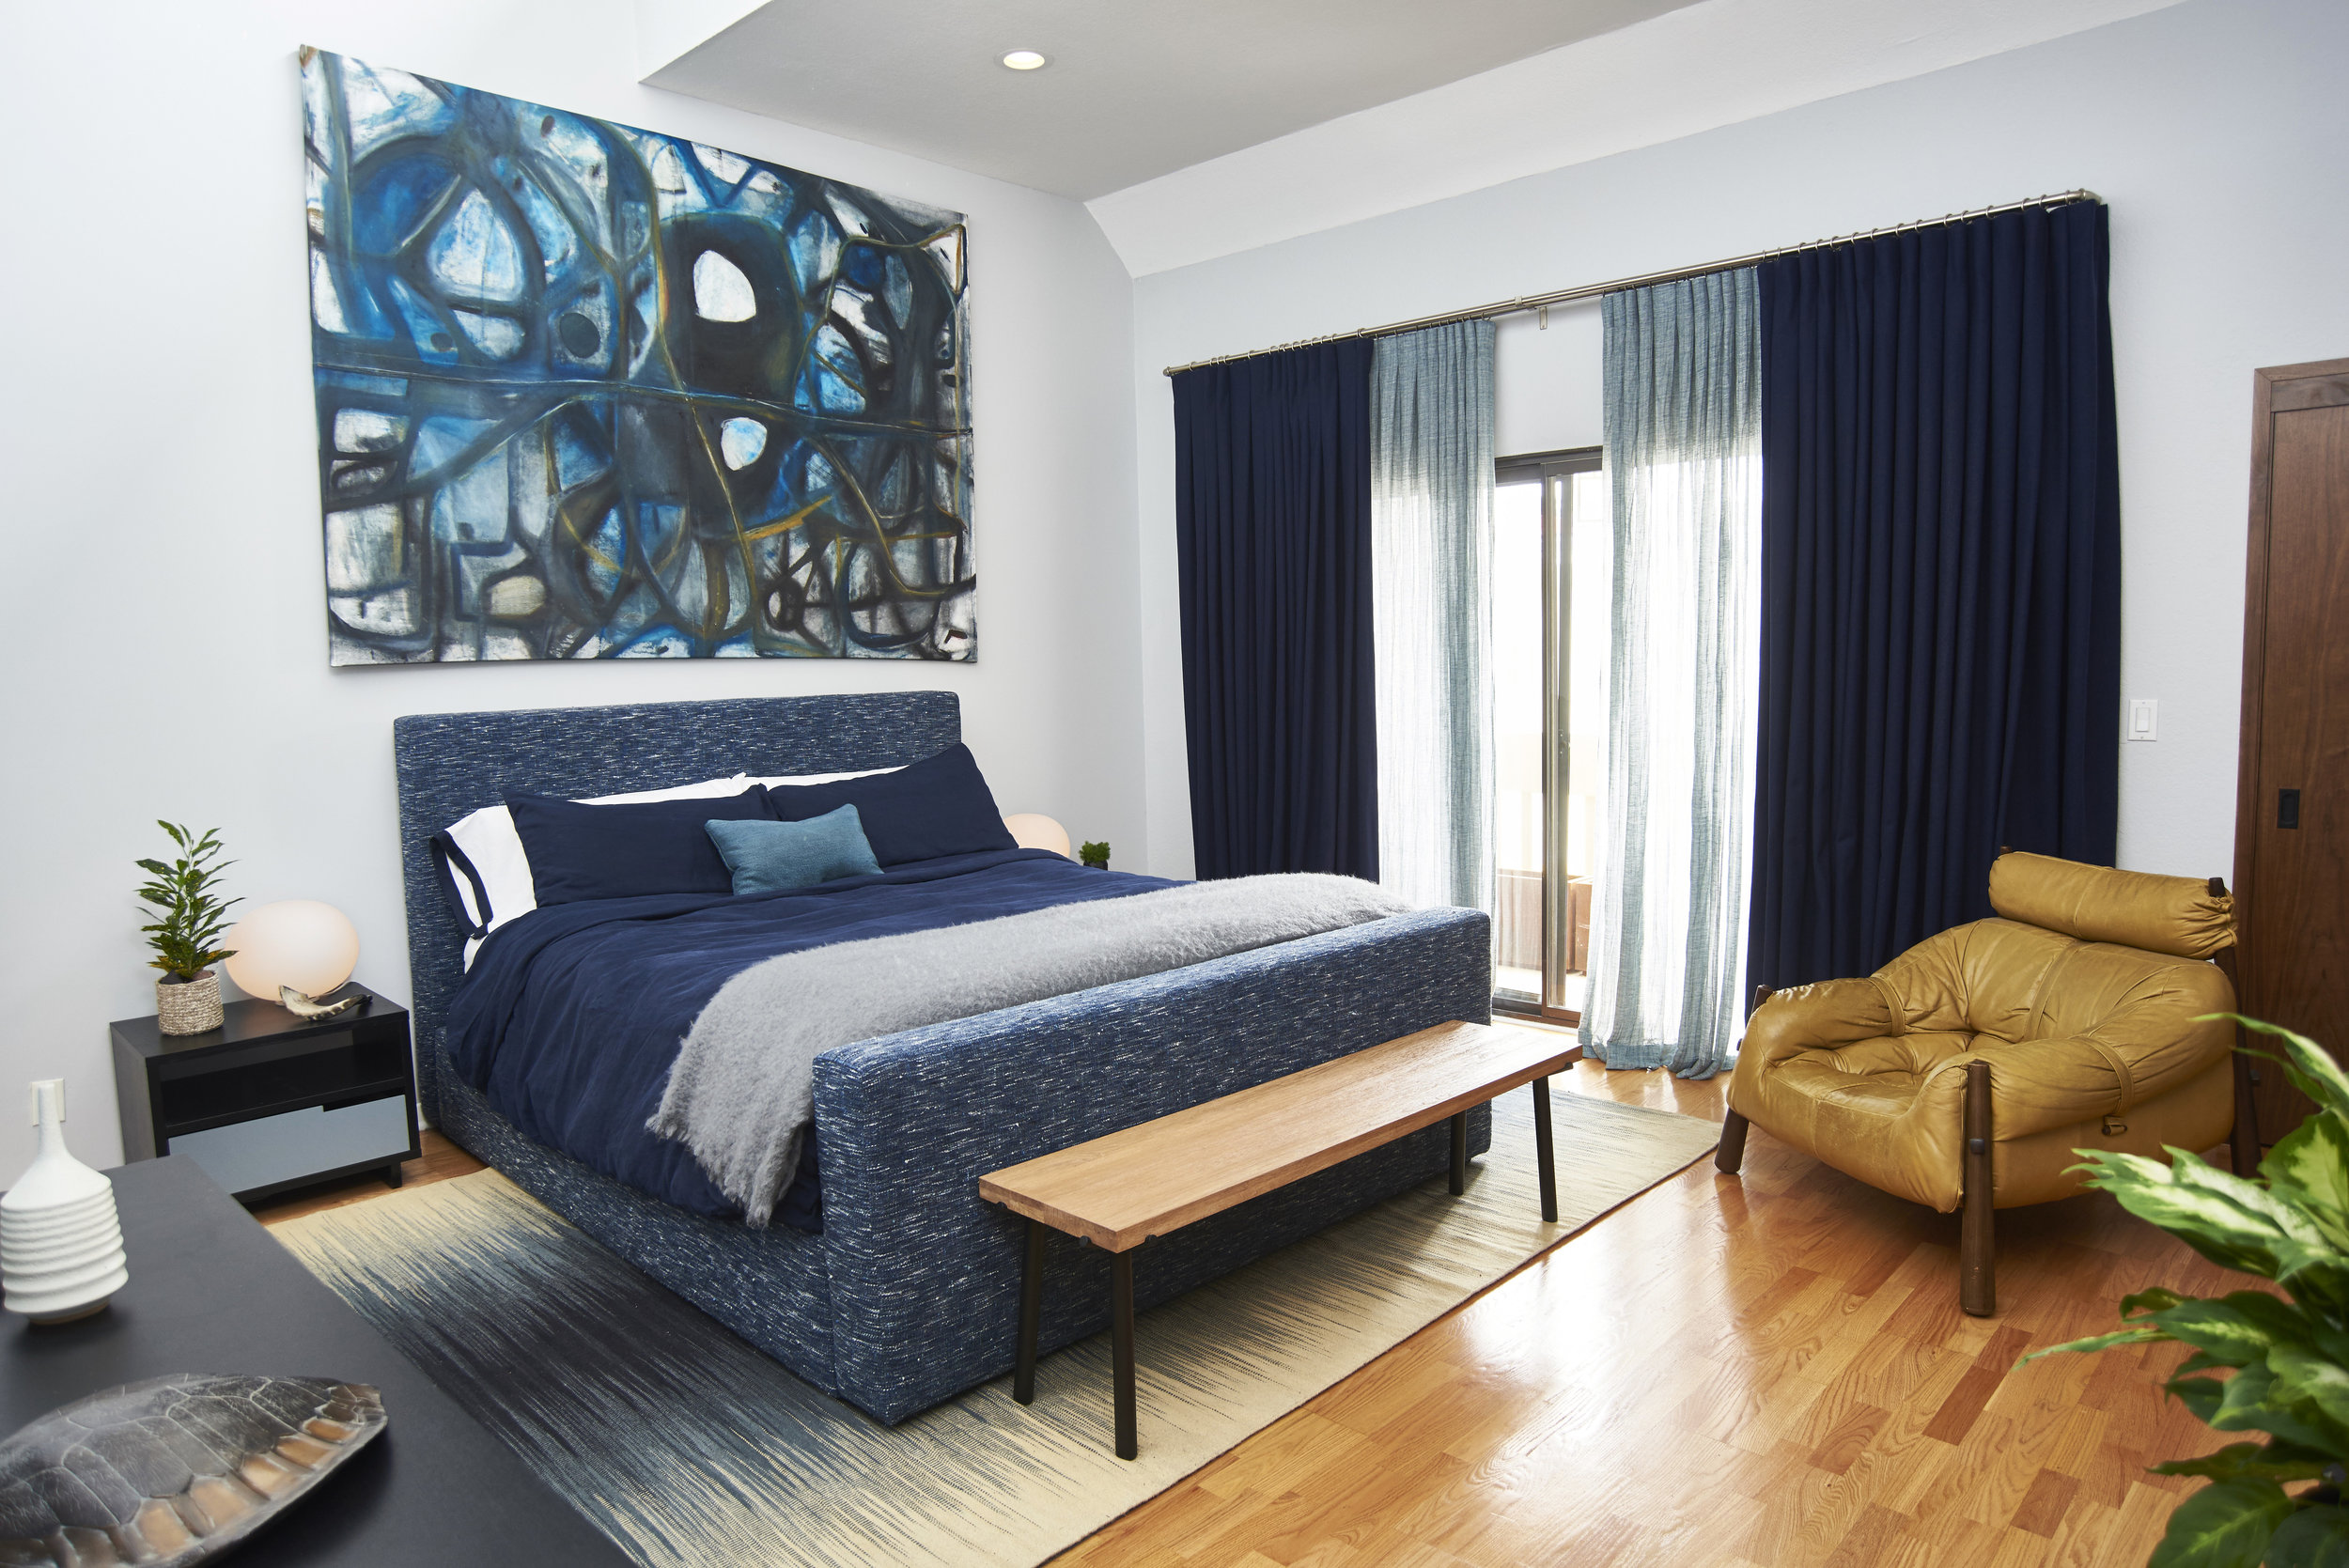 sarah-barnard-design-brentwood-bedroom-30.jpg